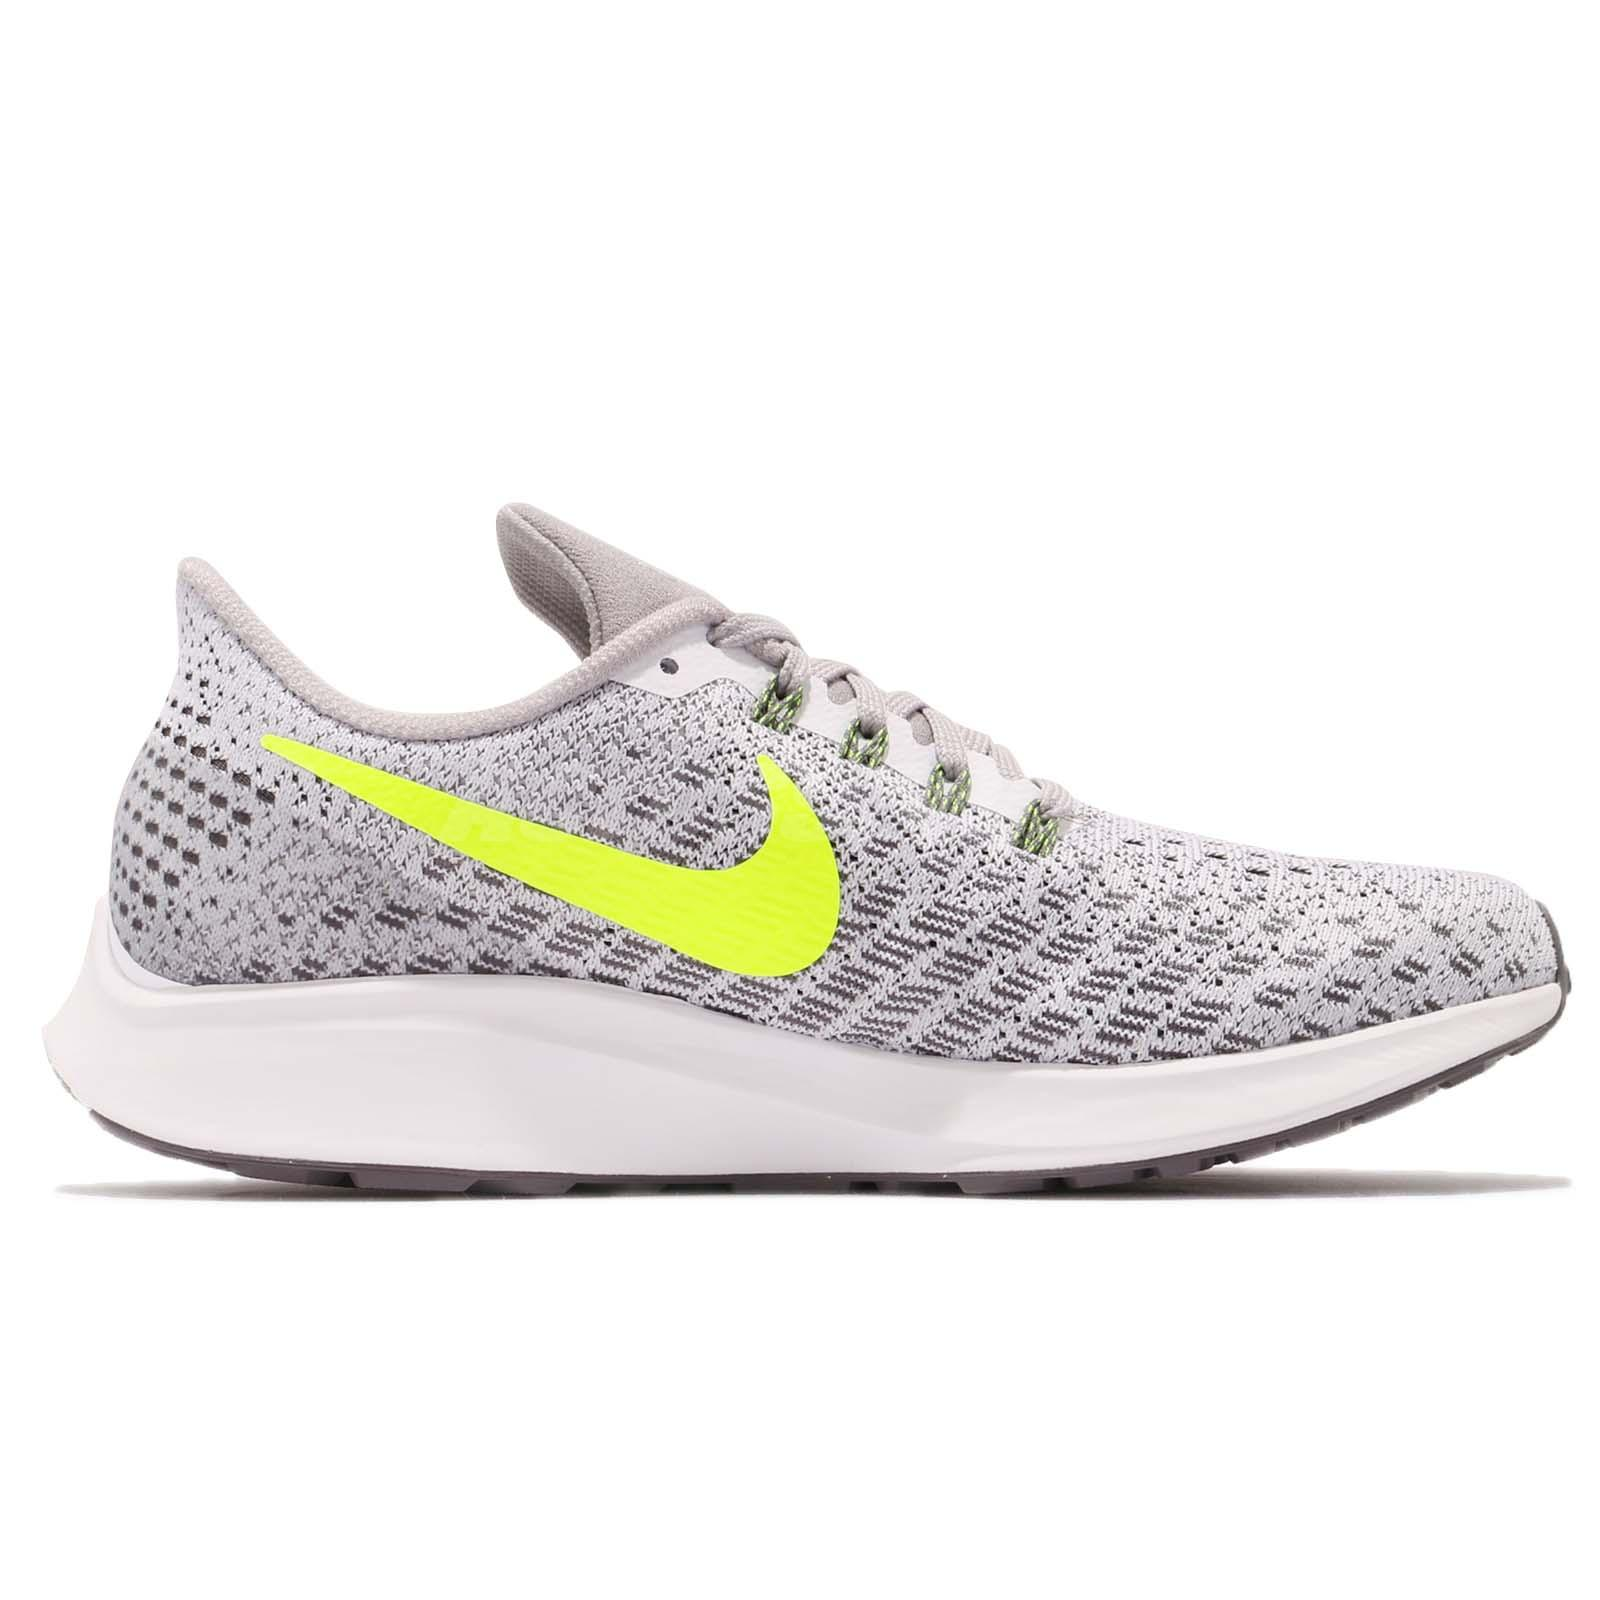 3f55d4d38e90 Nike Wmns Air Zoom Pegasus 35 White Volt Grey Women Running Shoes ...